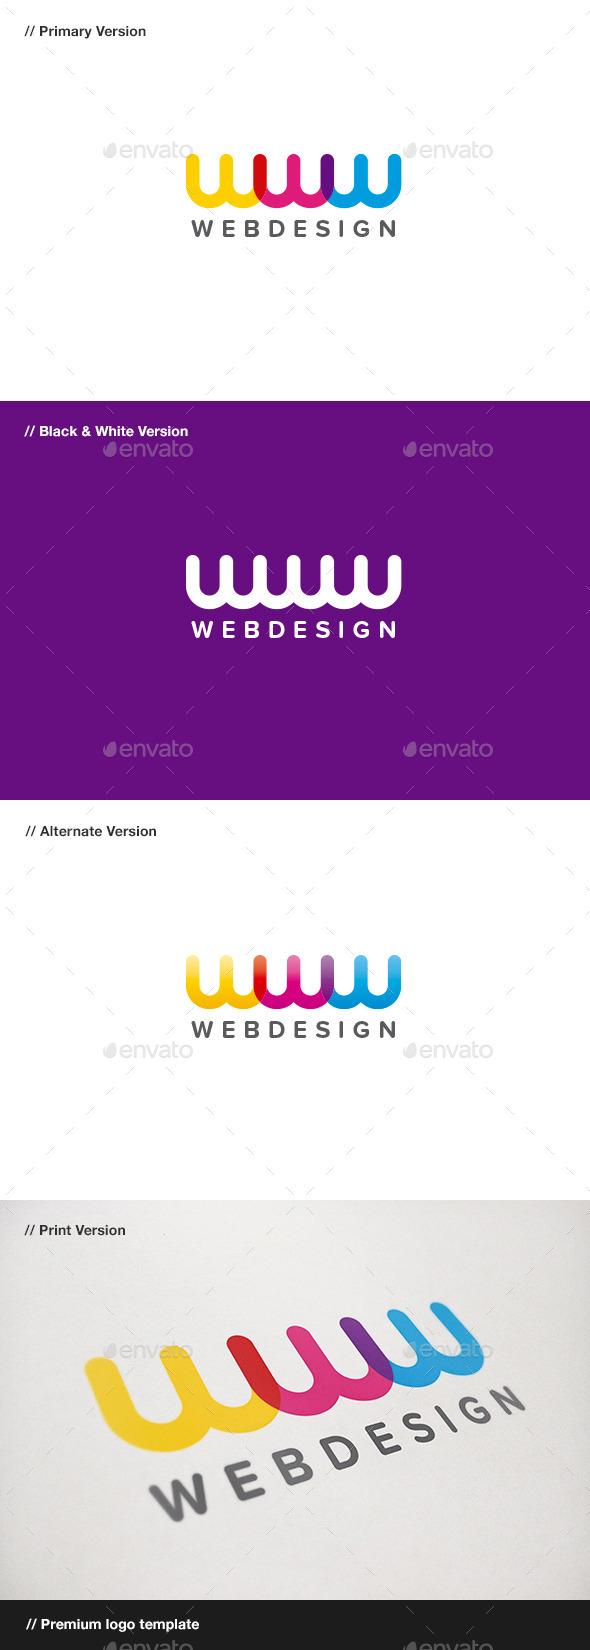 Web Design - Letter W Logo